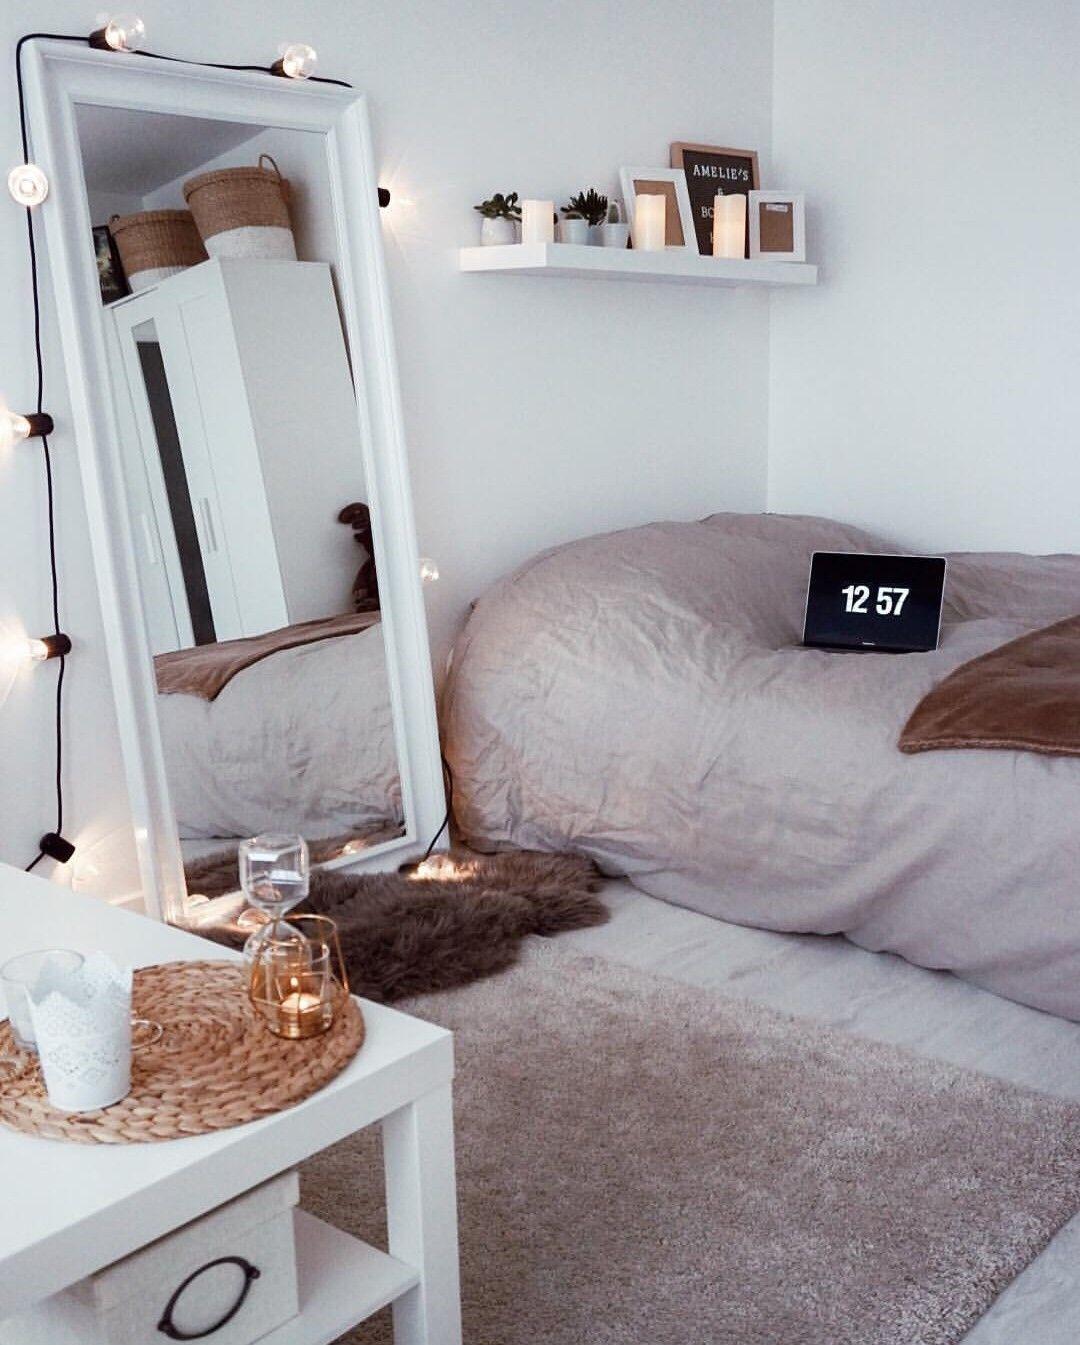 Little Boy Bedroom Sets Catalogue: 15+ Catchiest Ninja ...